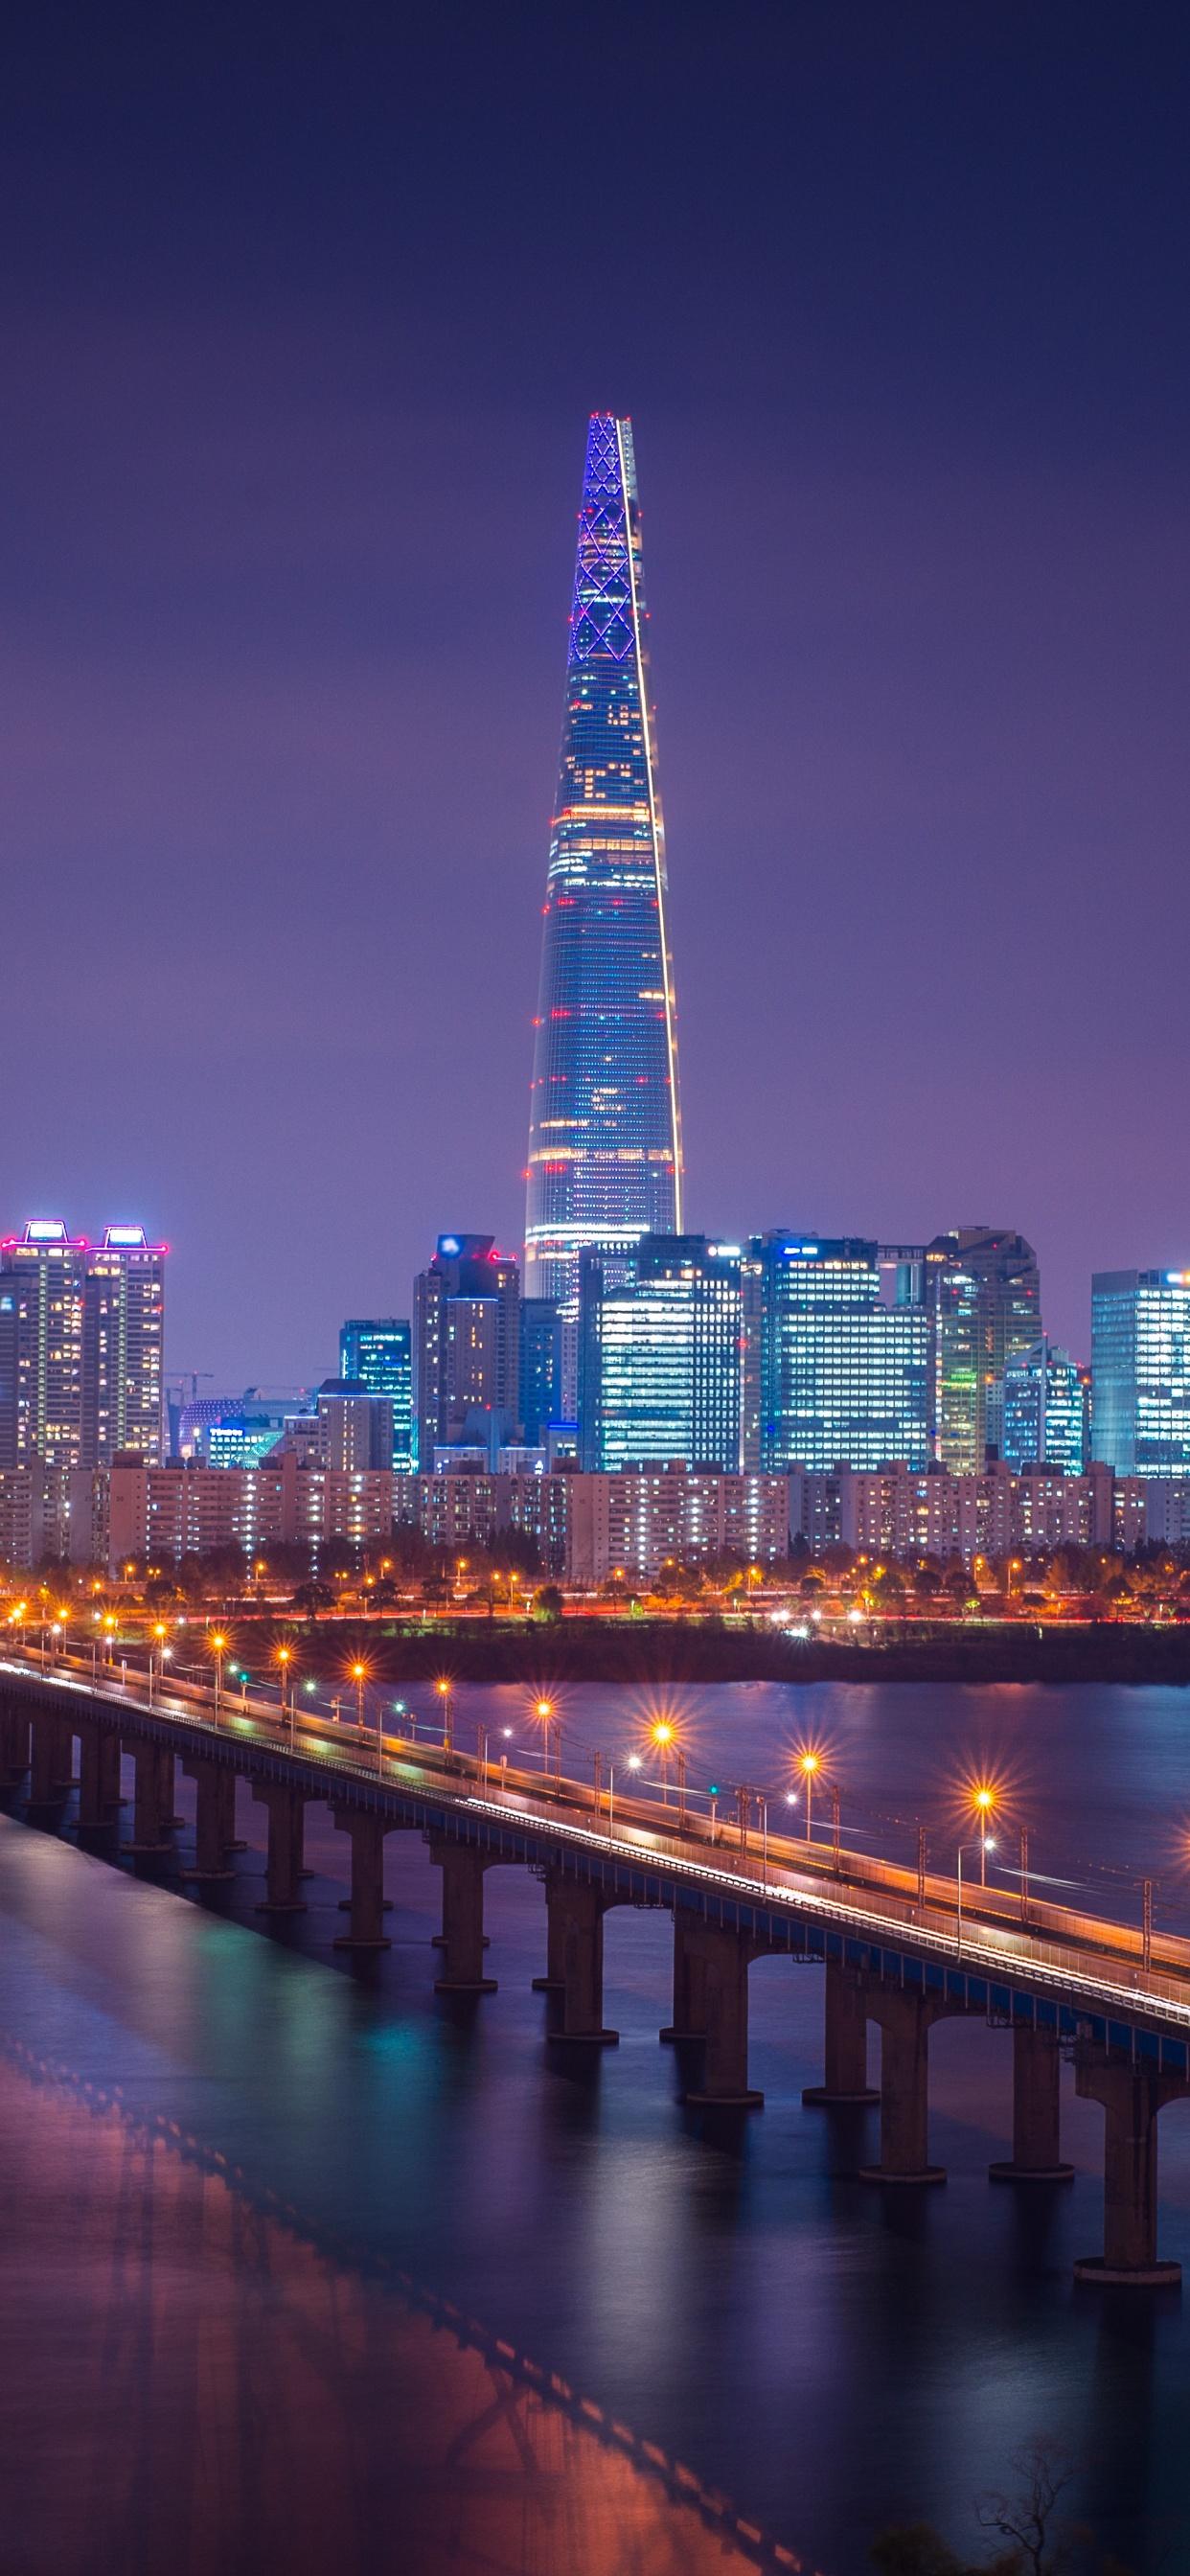 Lotte Tower 4k Wallpaper Seoul Cityscape Bridge Night City Lights South Korea 5k World 1315